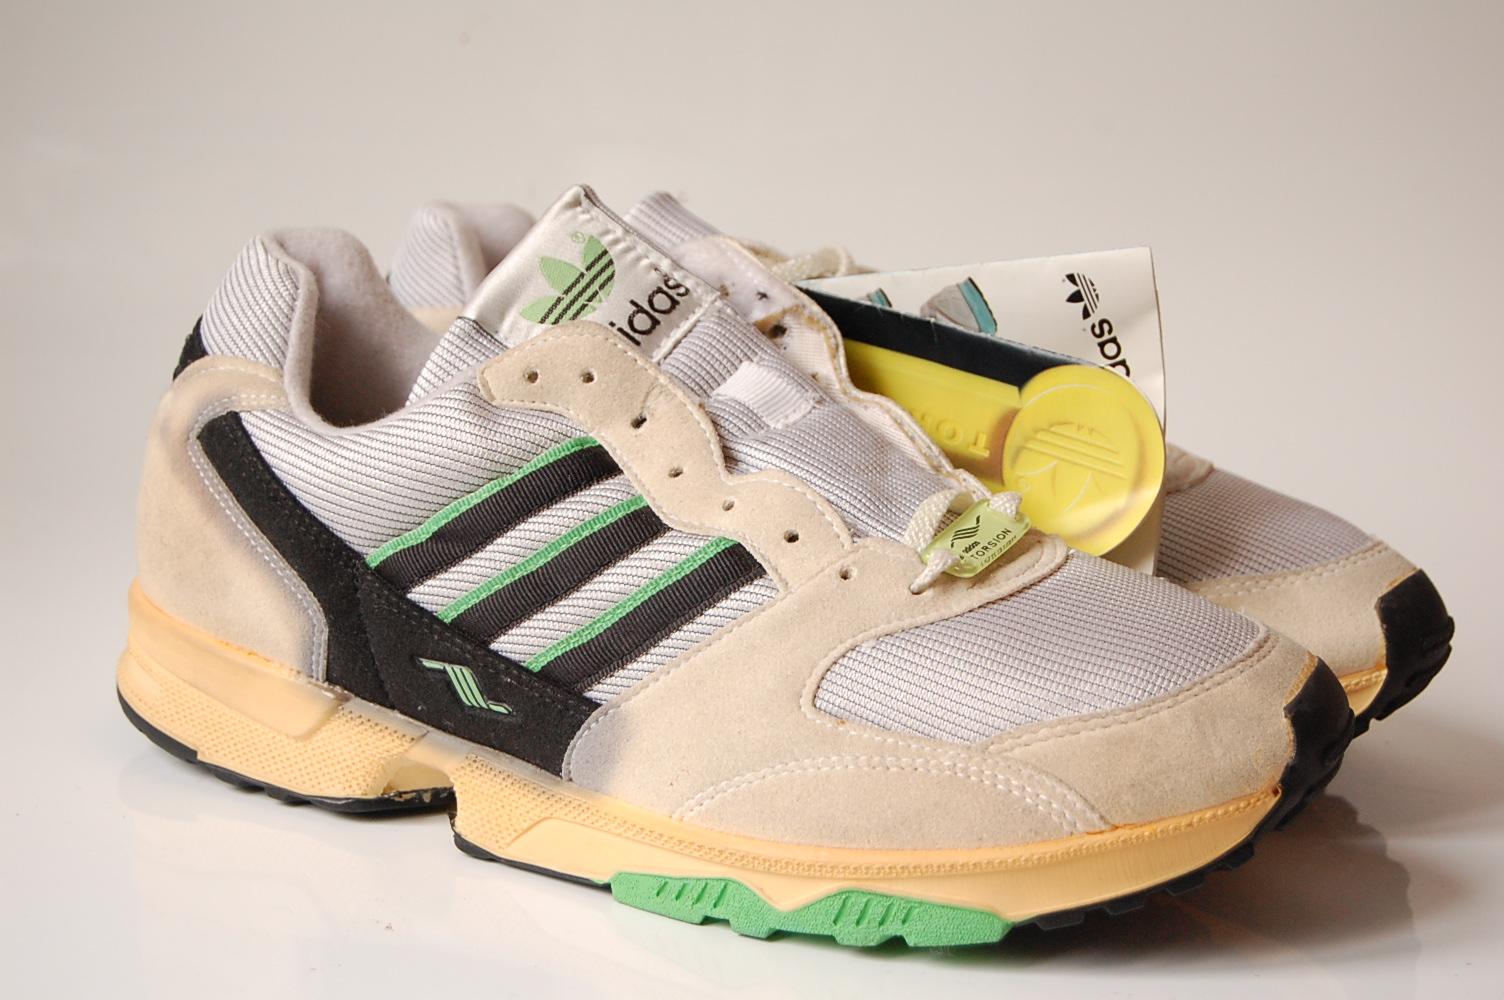 adidas zx torsion